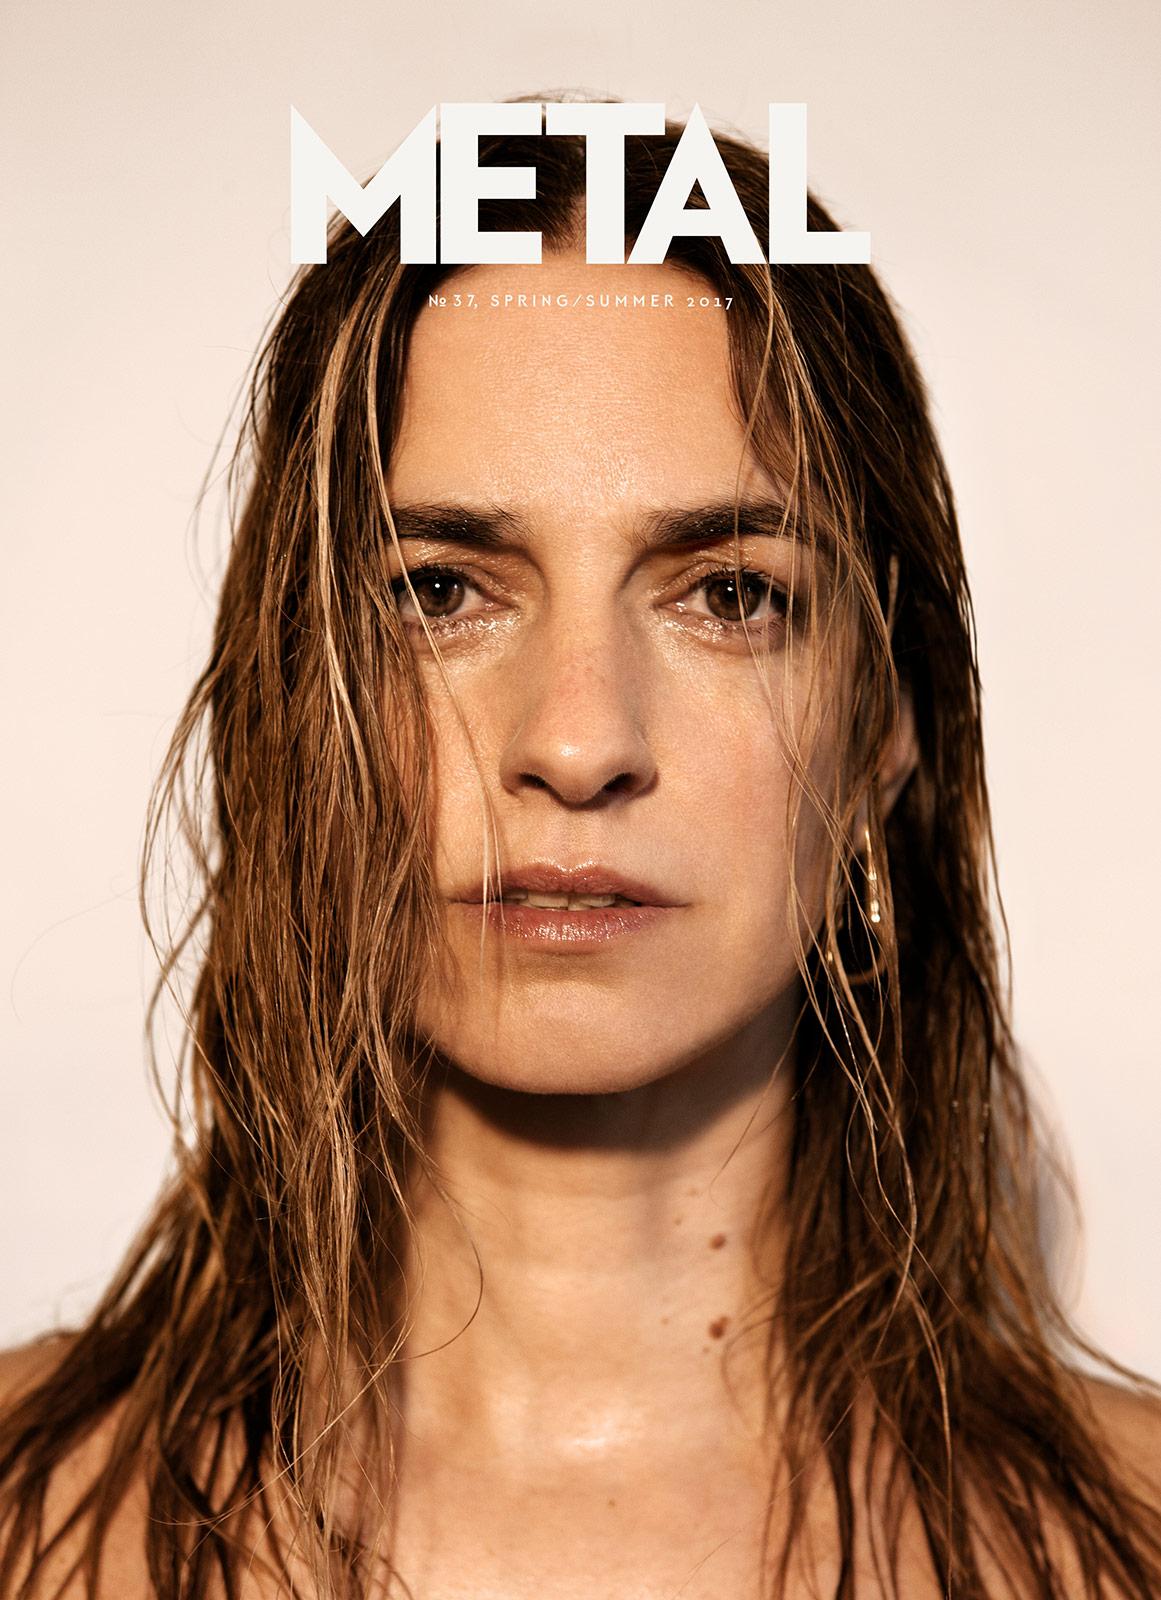 COVER 4 - Joana Preiss photographed by Noel Quintela wearing earring Louis Vuitton.